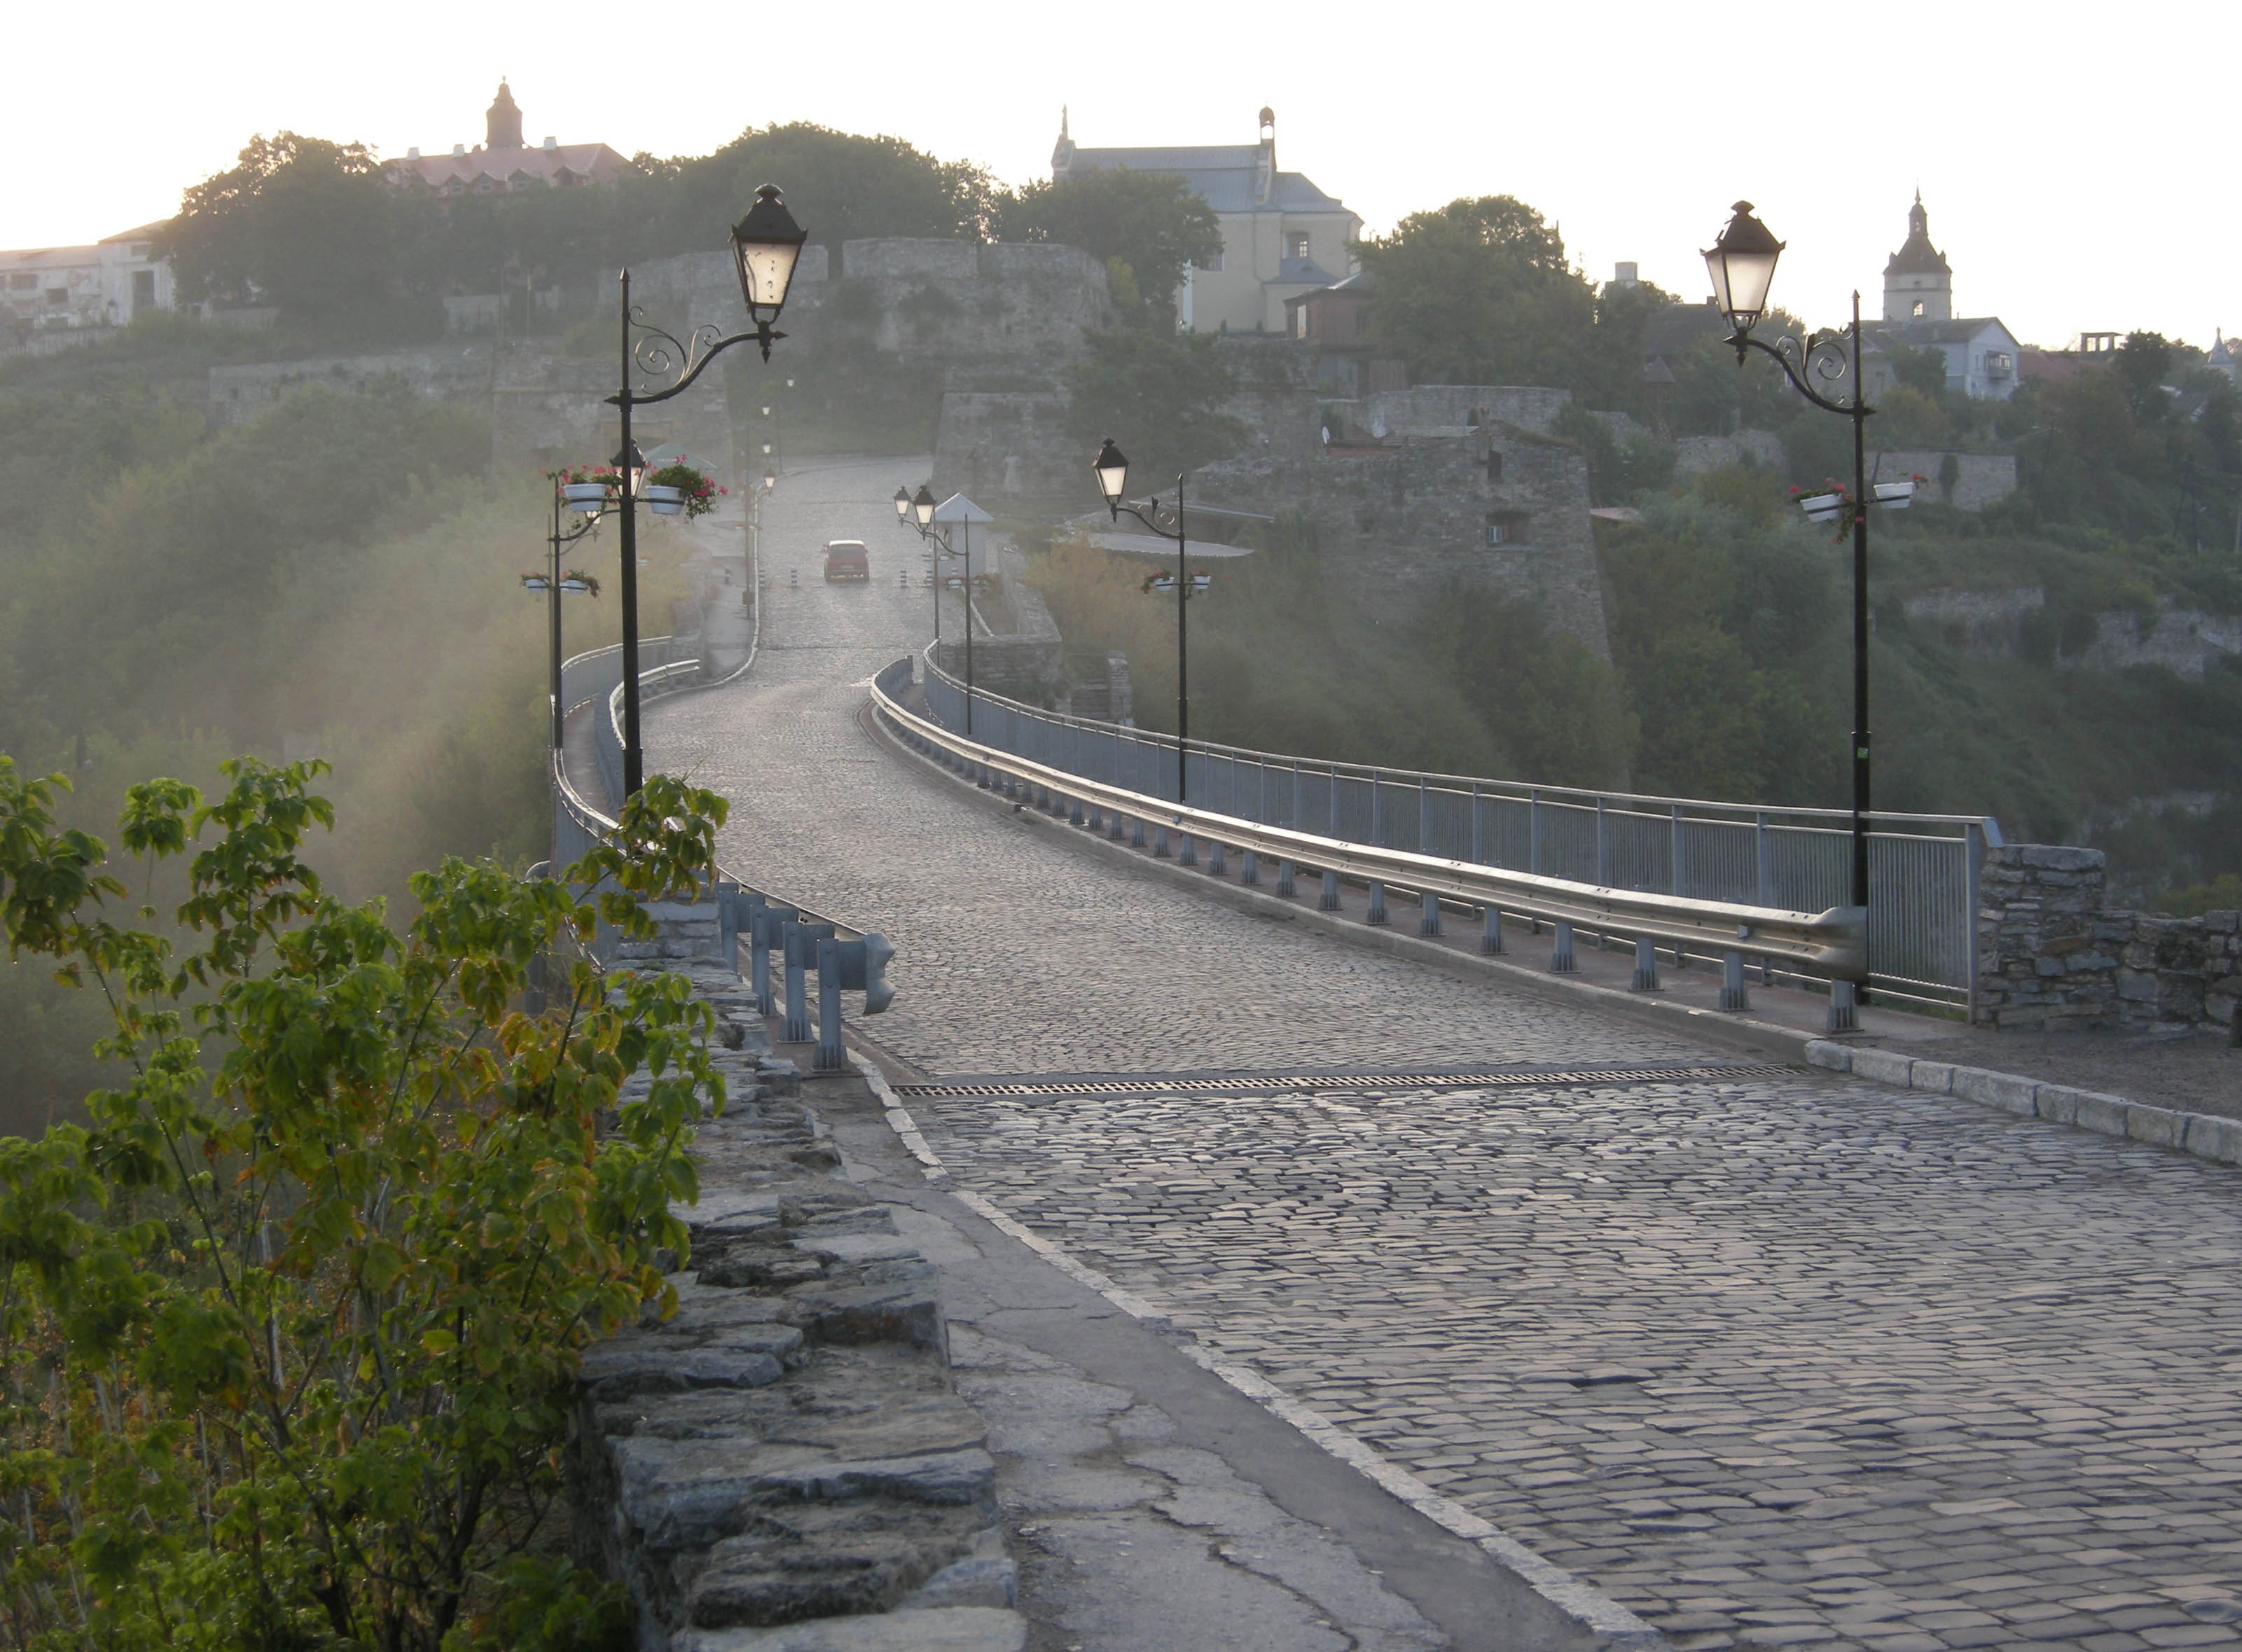 For the weekend - in Kamenetz-Podolsk